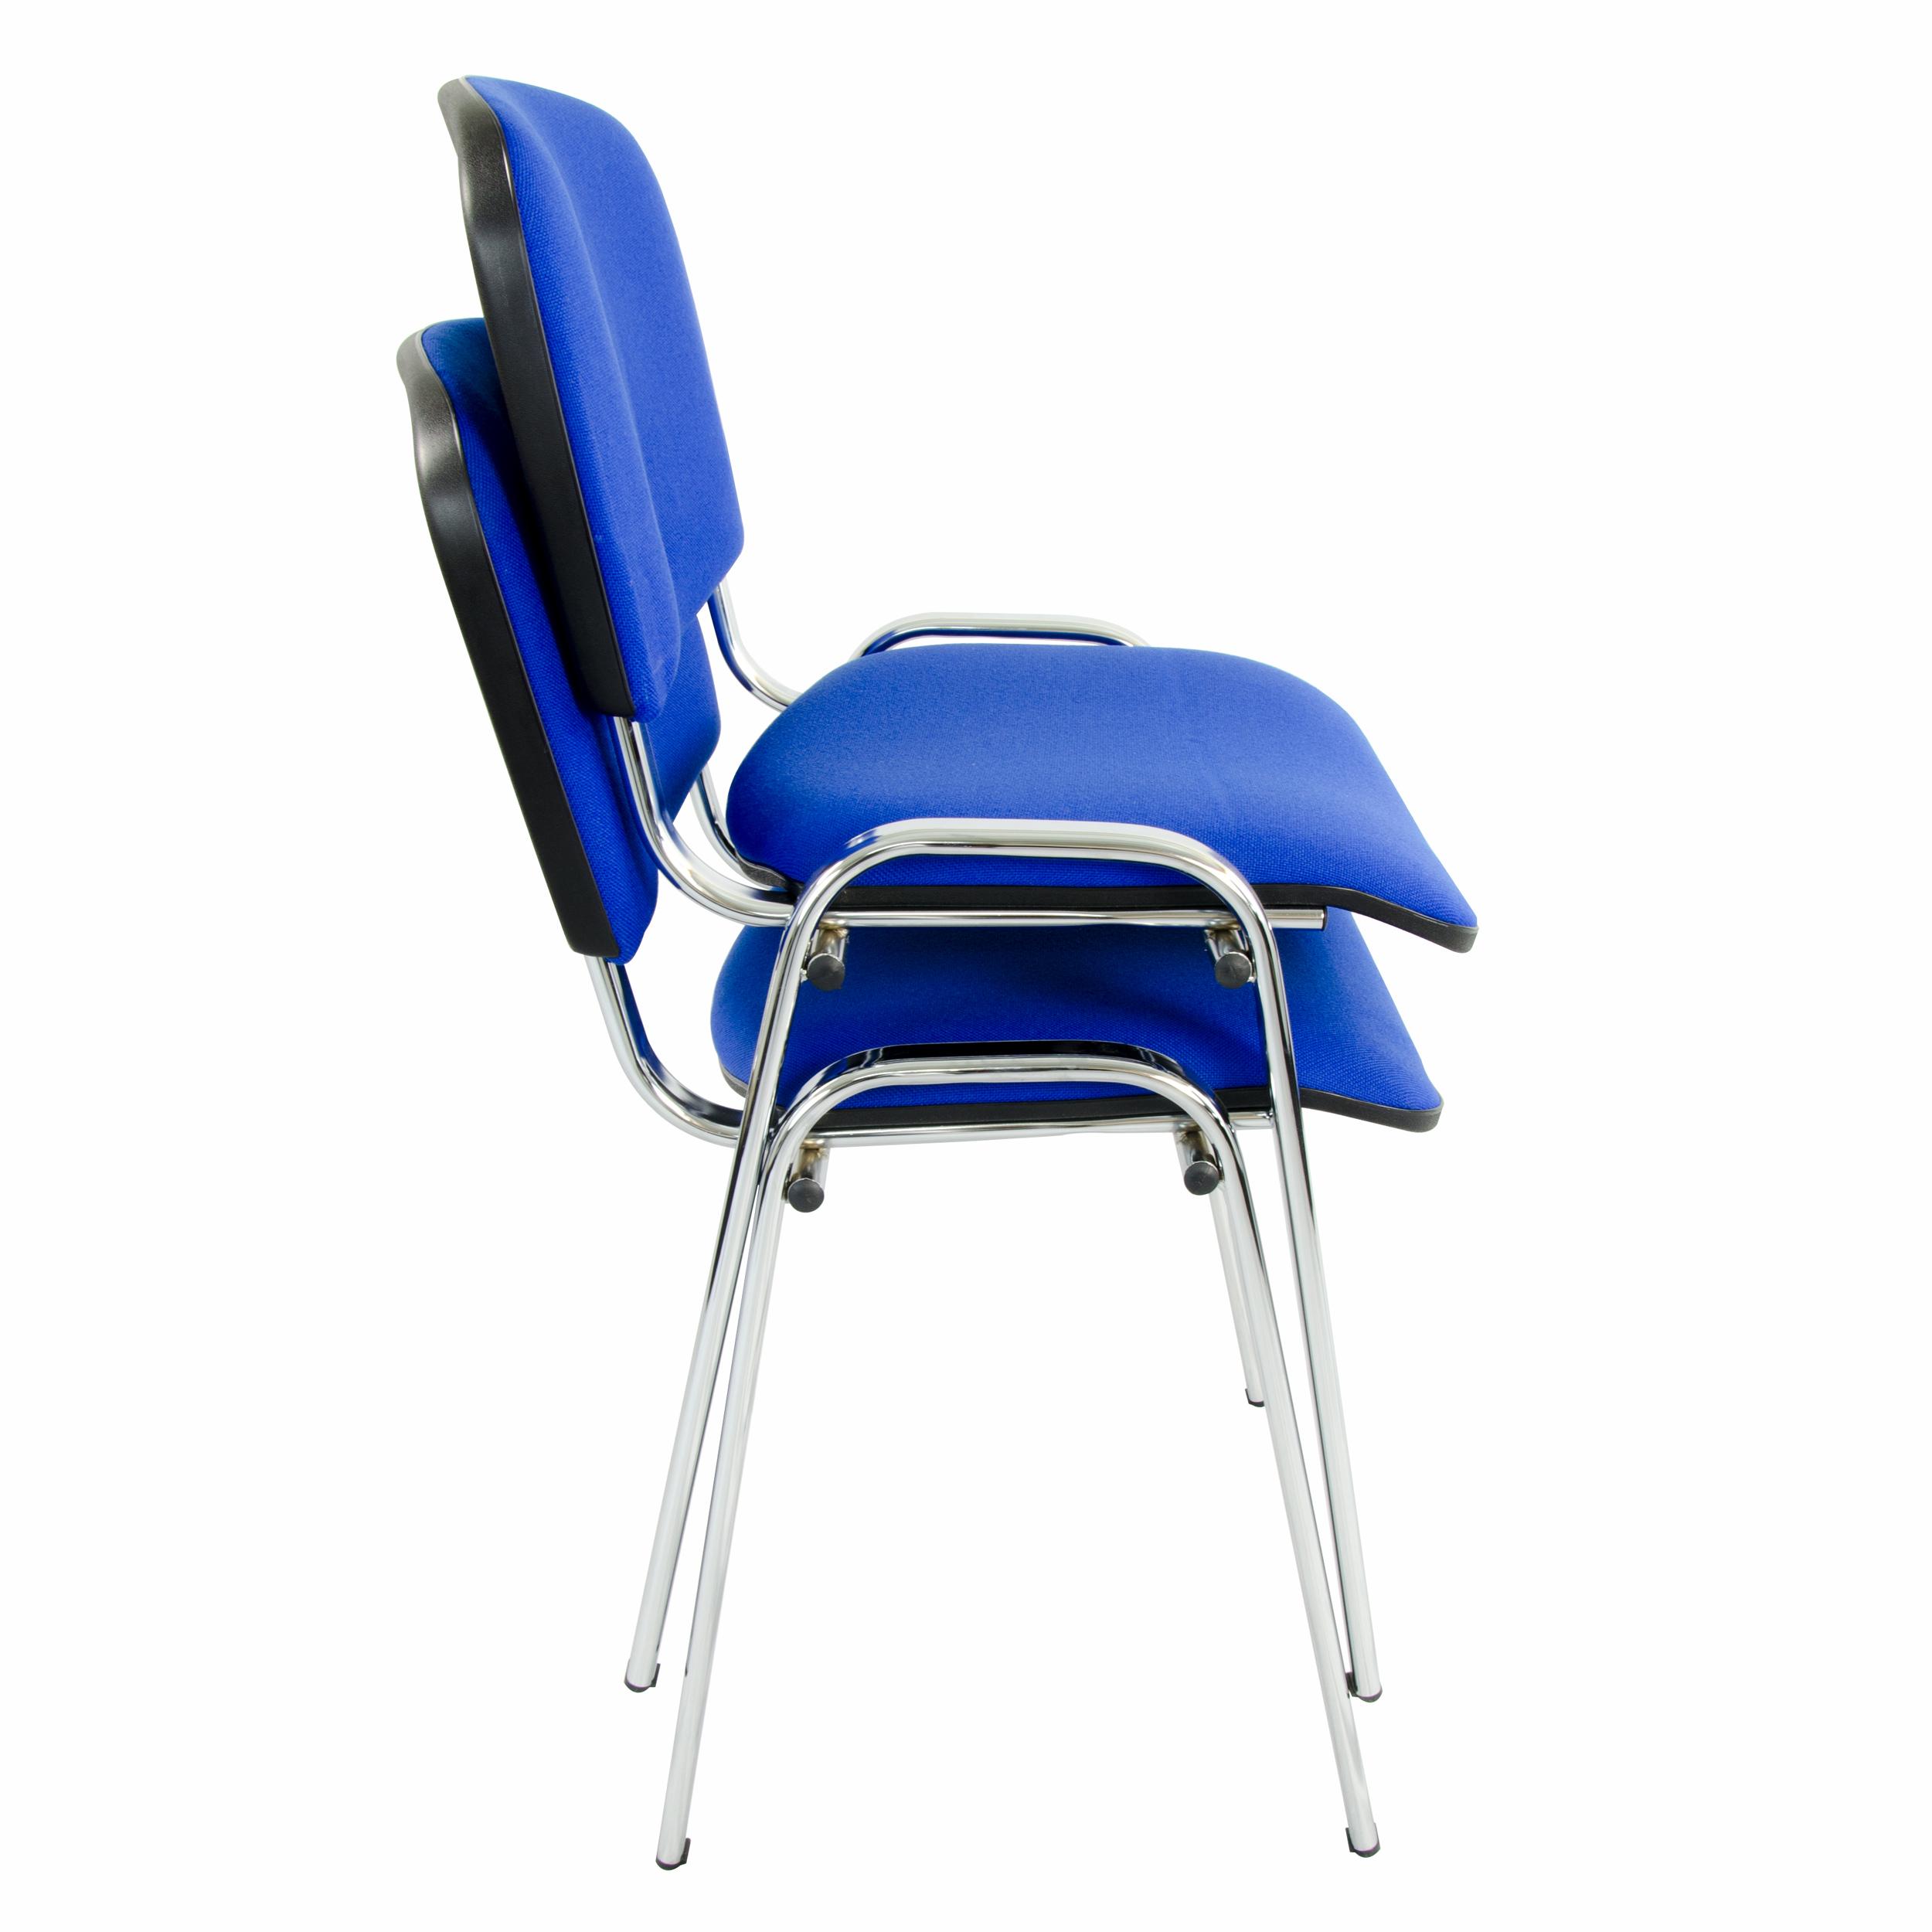 LEO Besucherstuhl blau Stapelbar Konferenzstuhl Seminarstuhl Stuhl Stapelstuhl